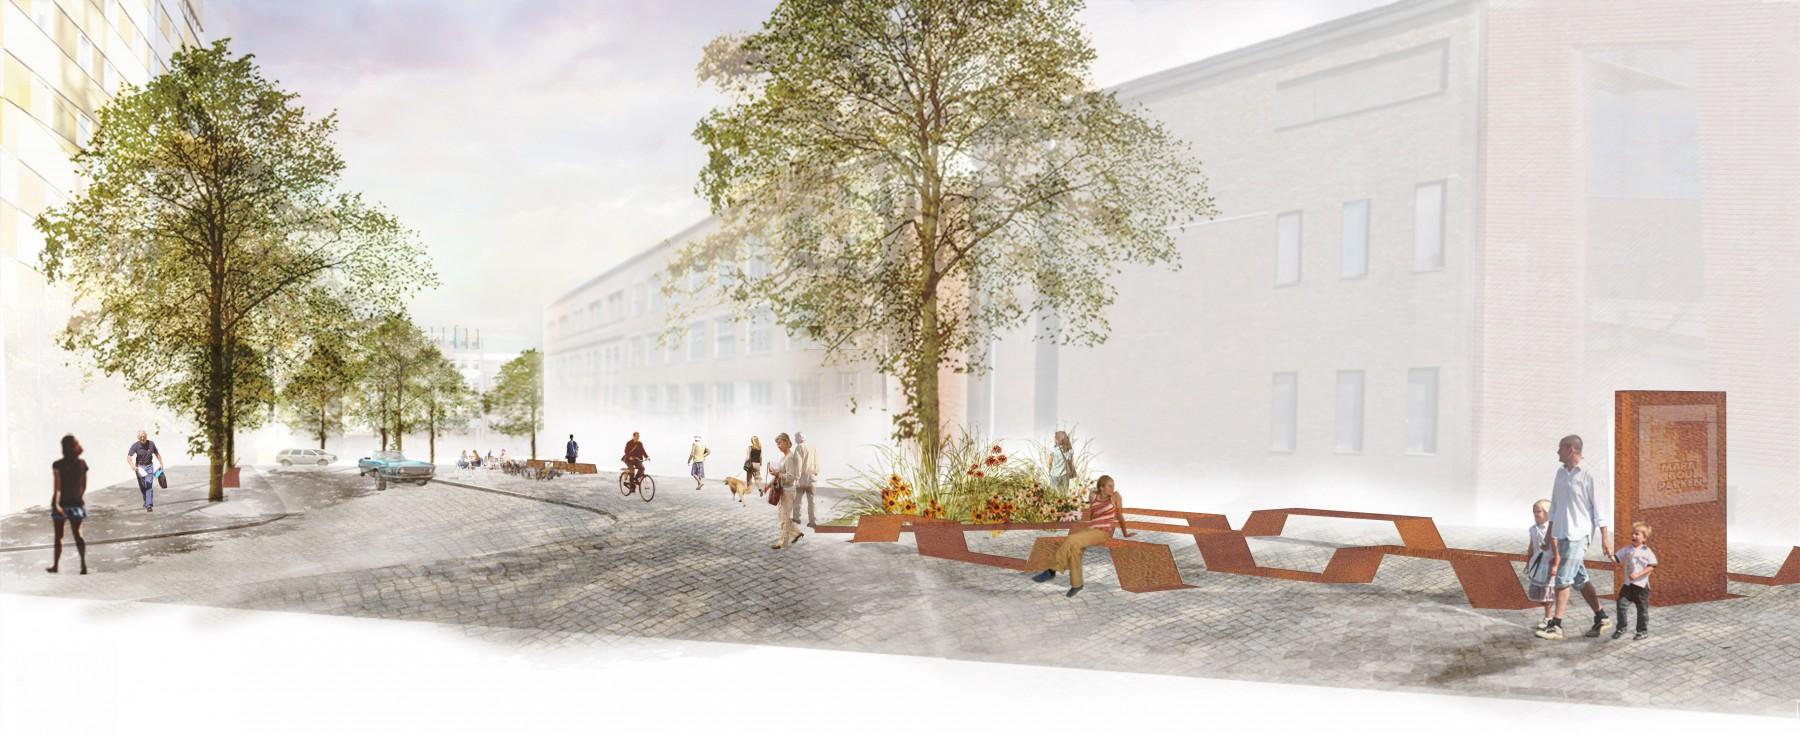 Sundbybergs_torg_LAND_2012_2014_perspektiv